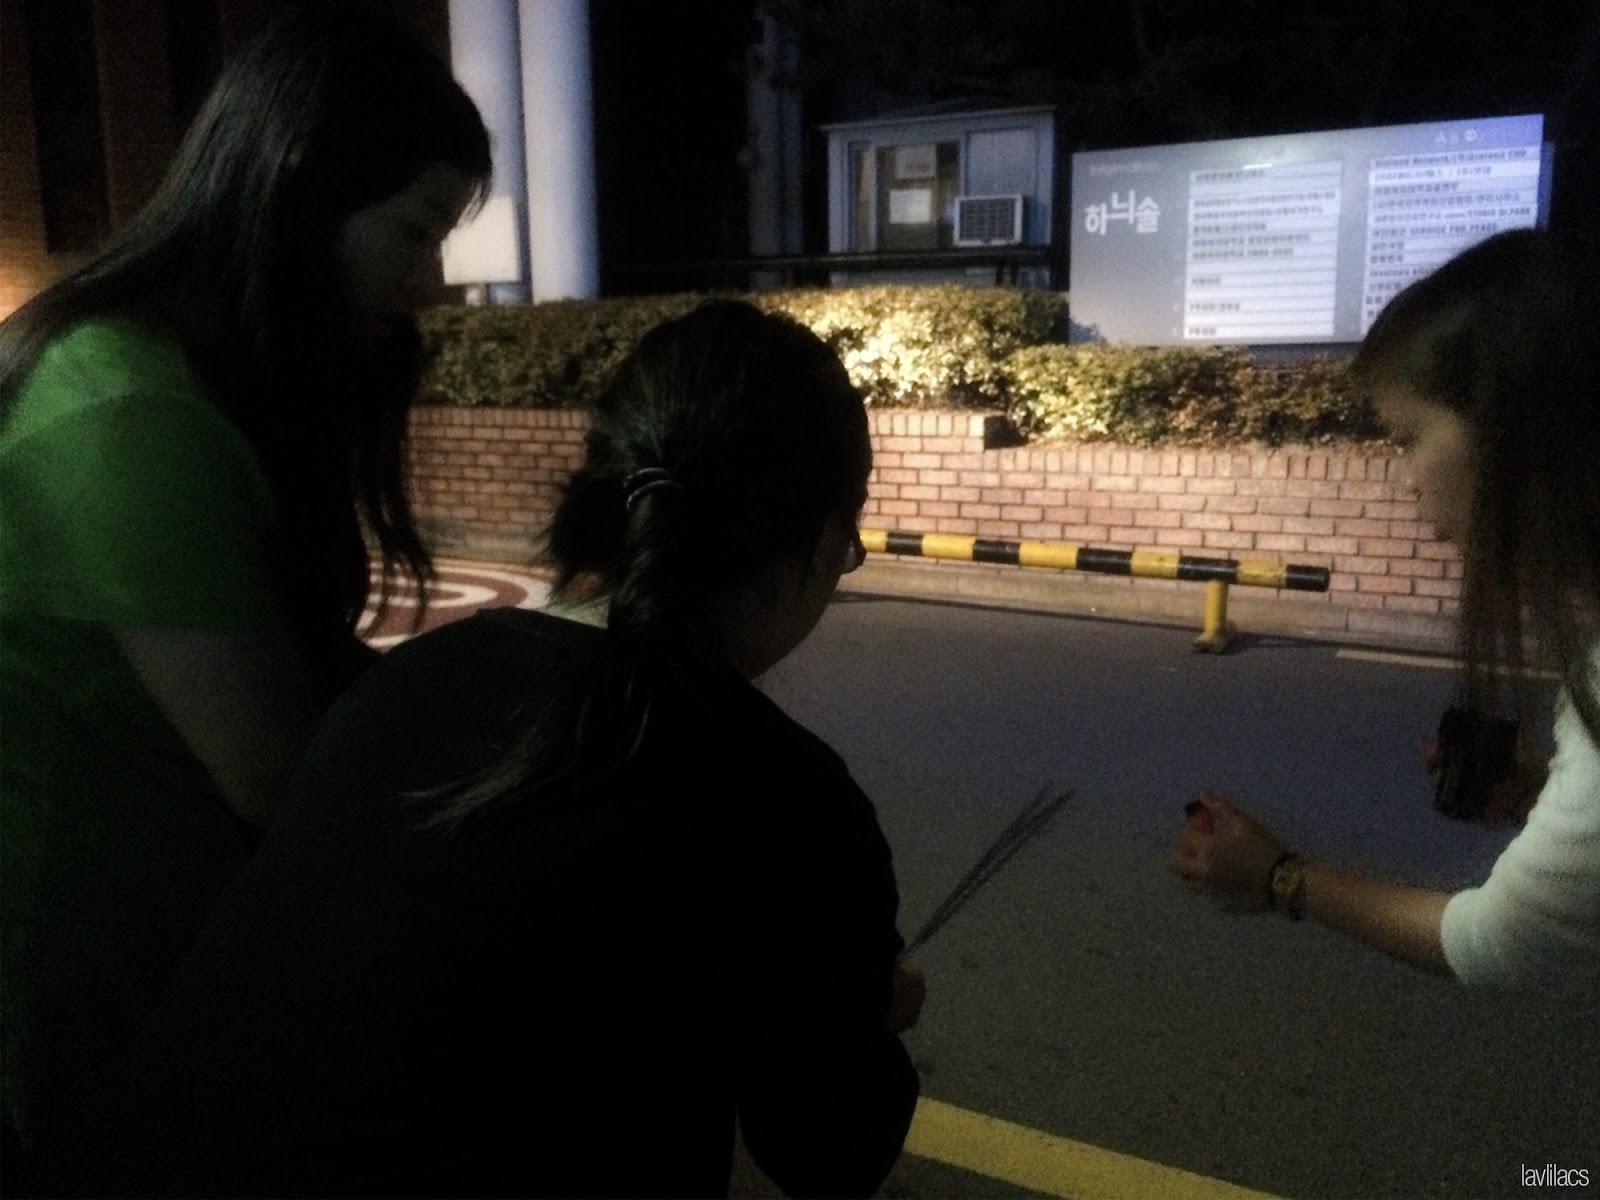 Seoul, Korea - Summer Study Abroad 2014 - Setting fireworks near dorms